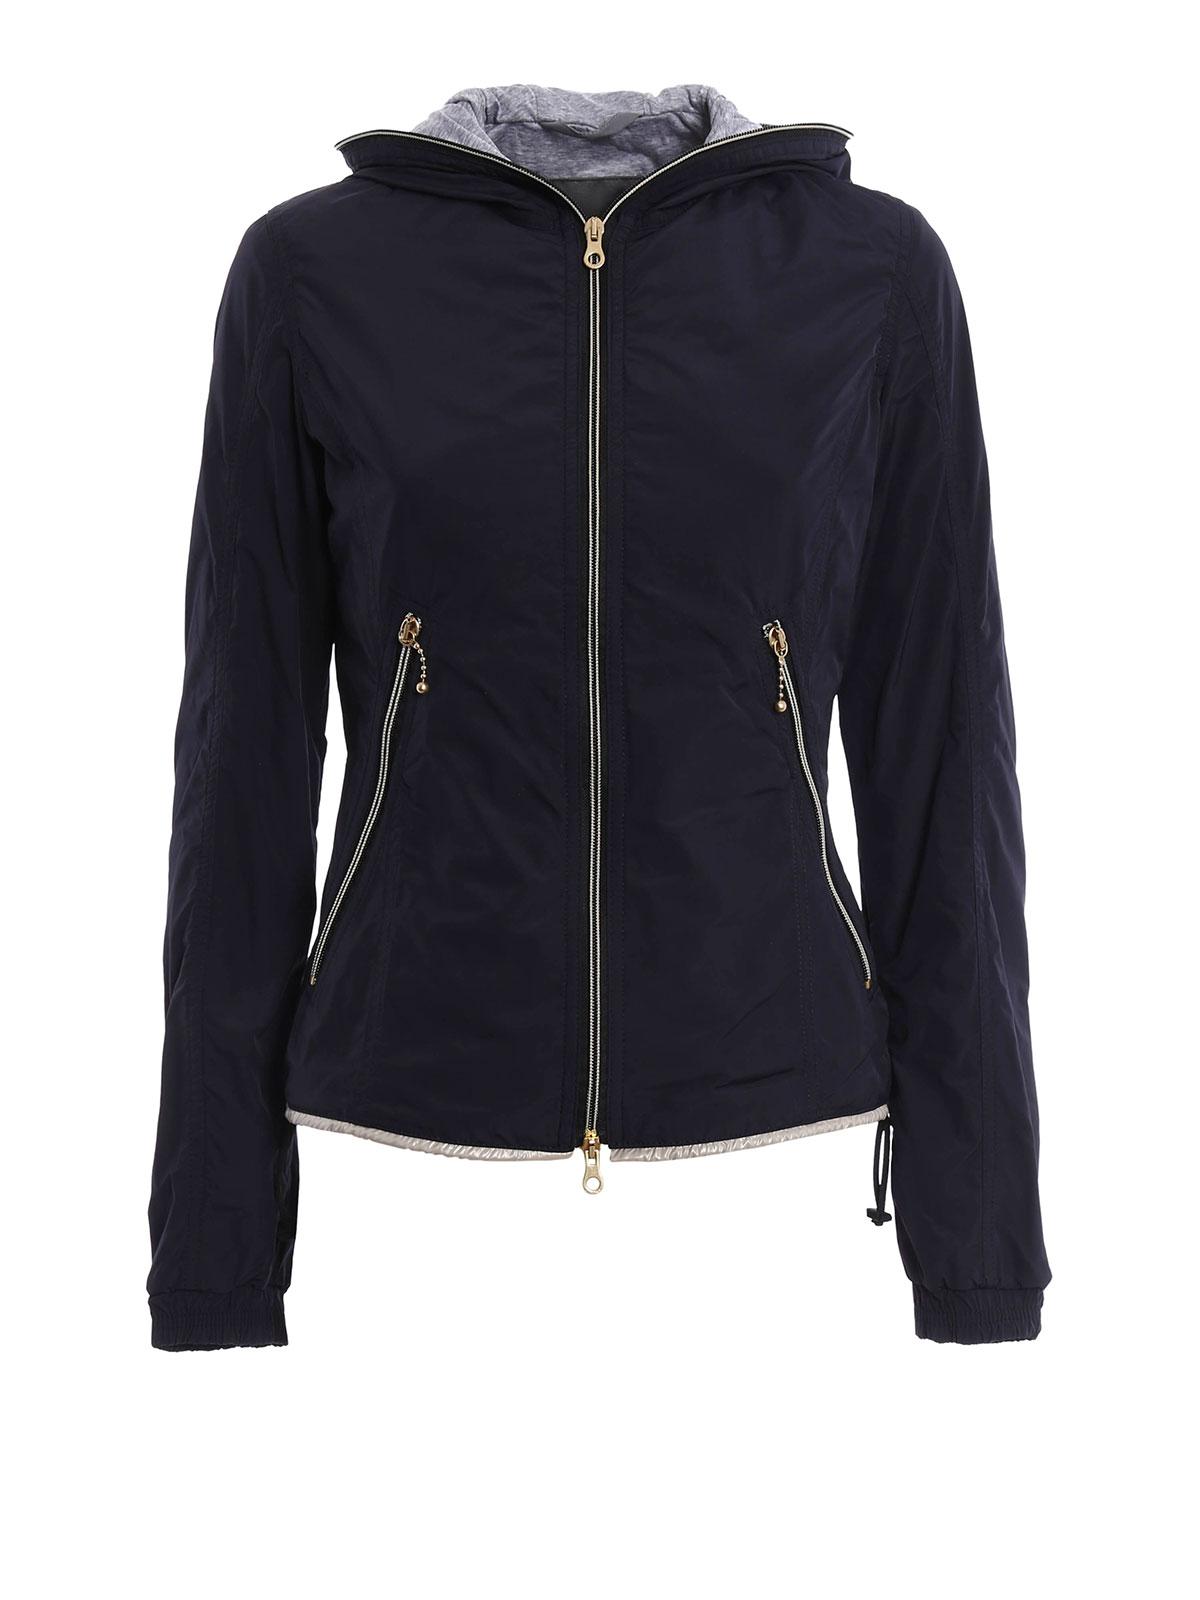 770 Trigedue waterproof jacket jackets padded Duvetica 0Omw8nvN